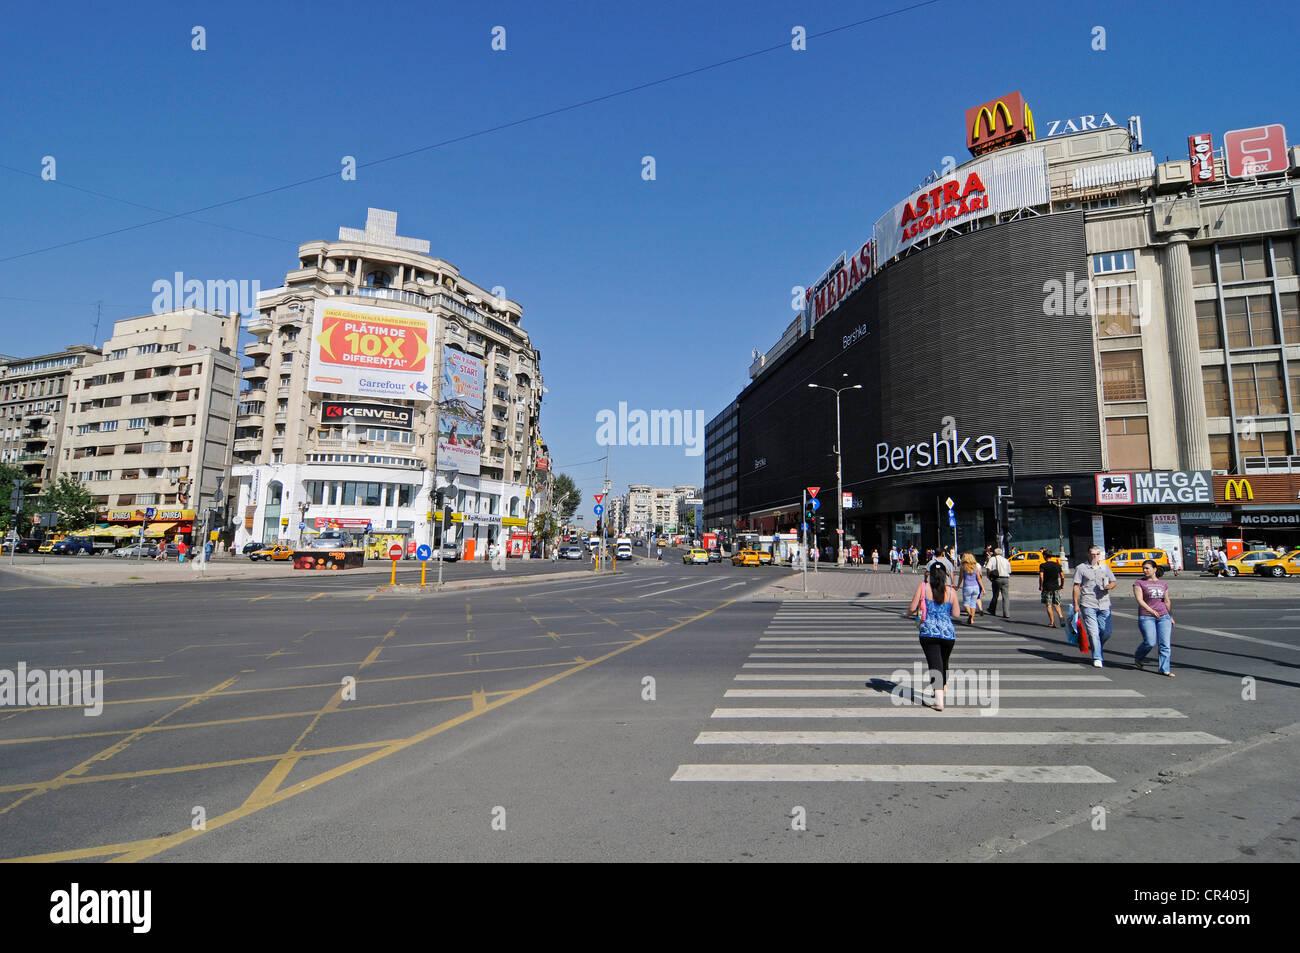 Shopping centre, street scene, billboards, Piata Unirii square, Bucharest, Romania, Eastern Europe, Europe, PublicGround - Stock Image